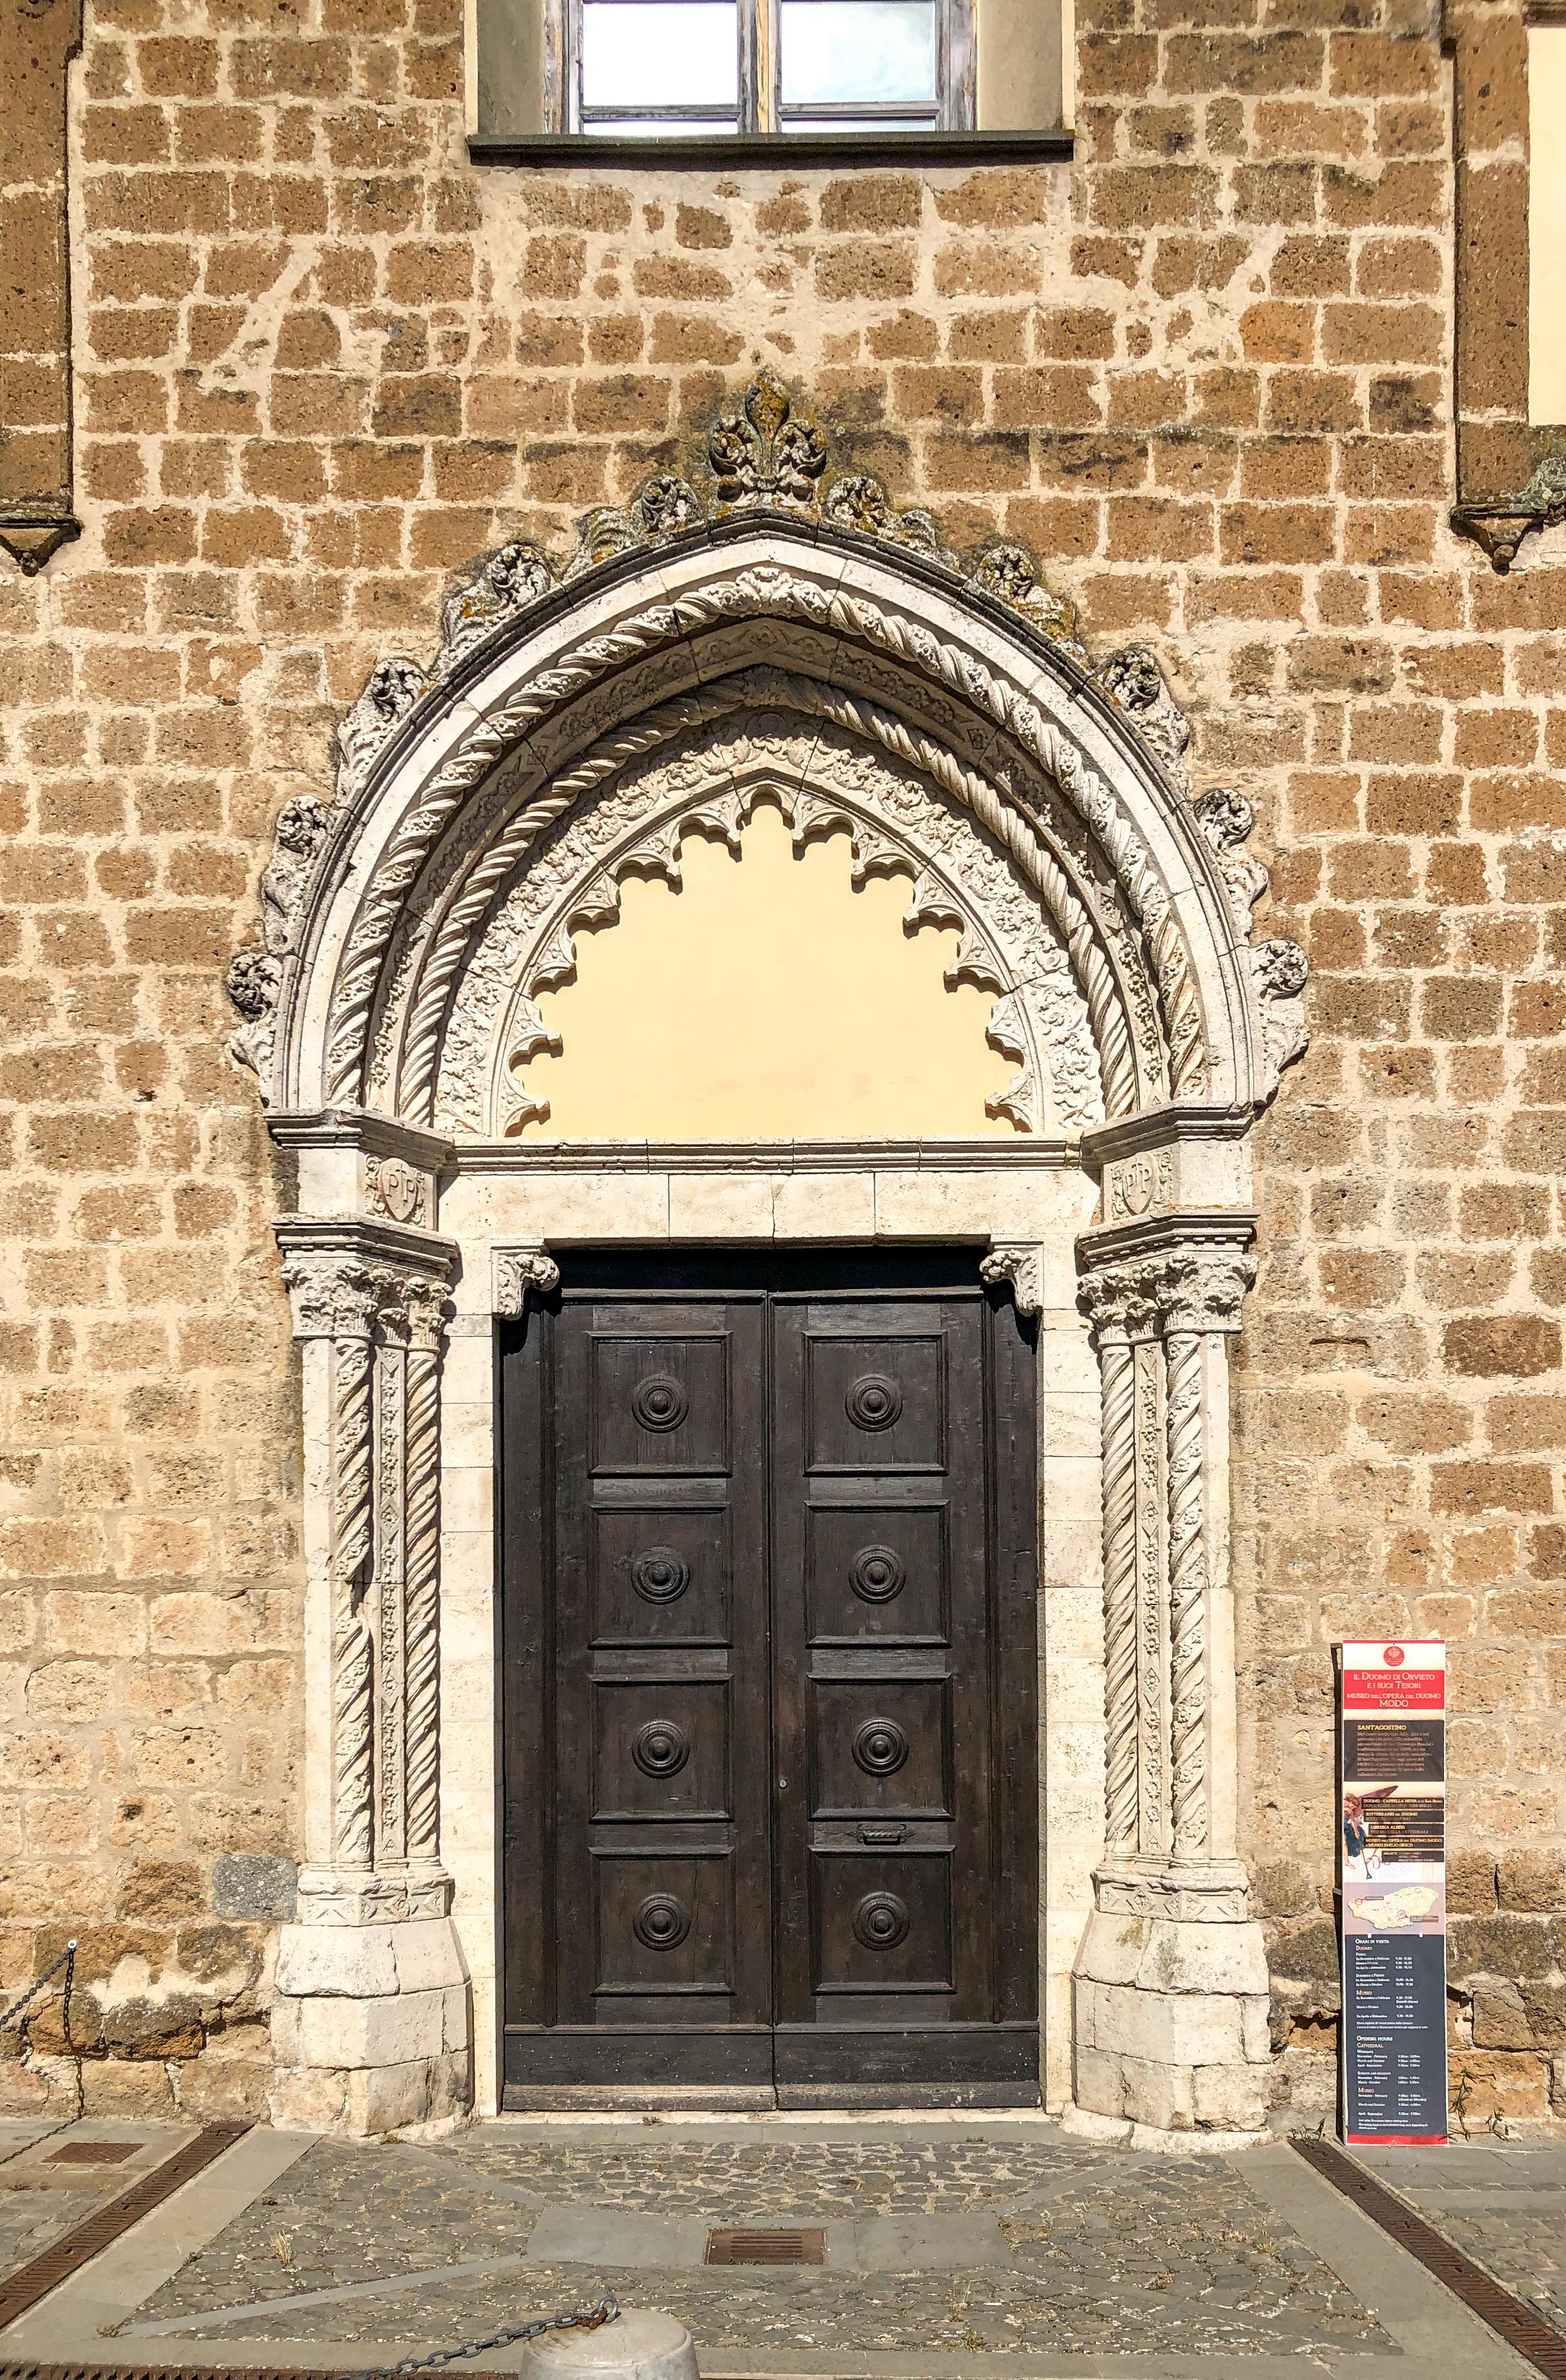 Italia - Italy - Casale Management - Travel - Orvieto - Ex Chiesa di Sant'Agostino